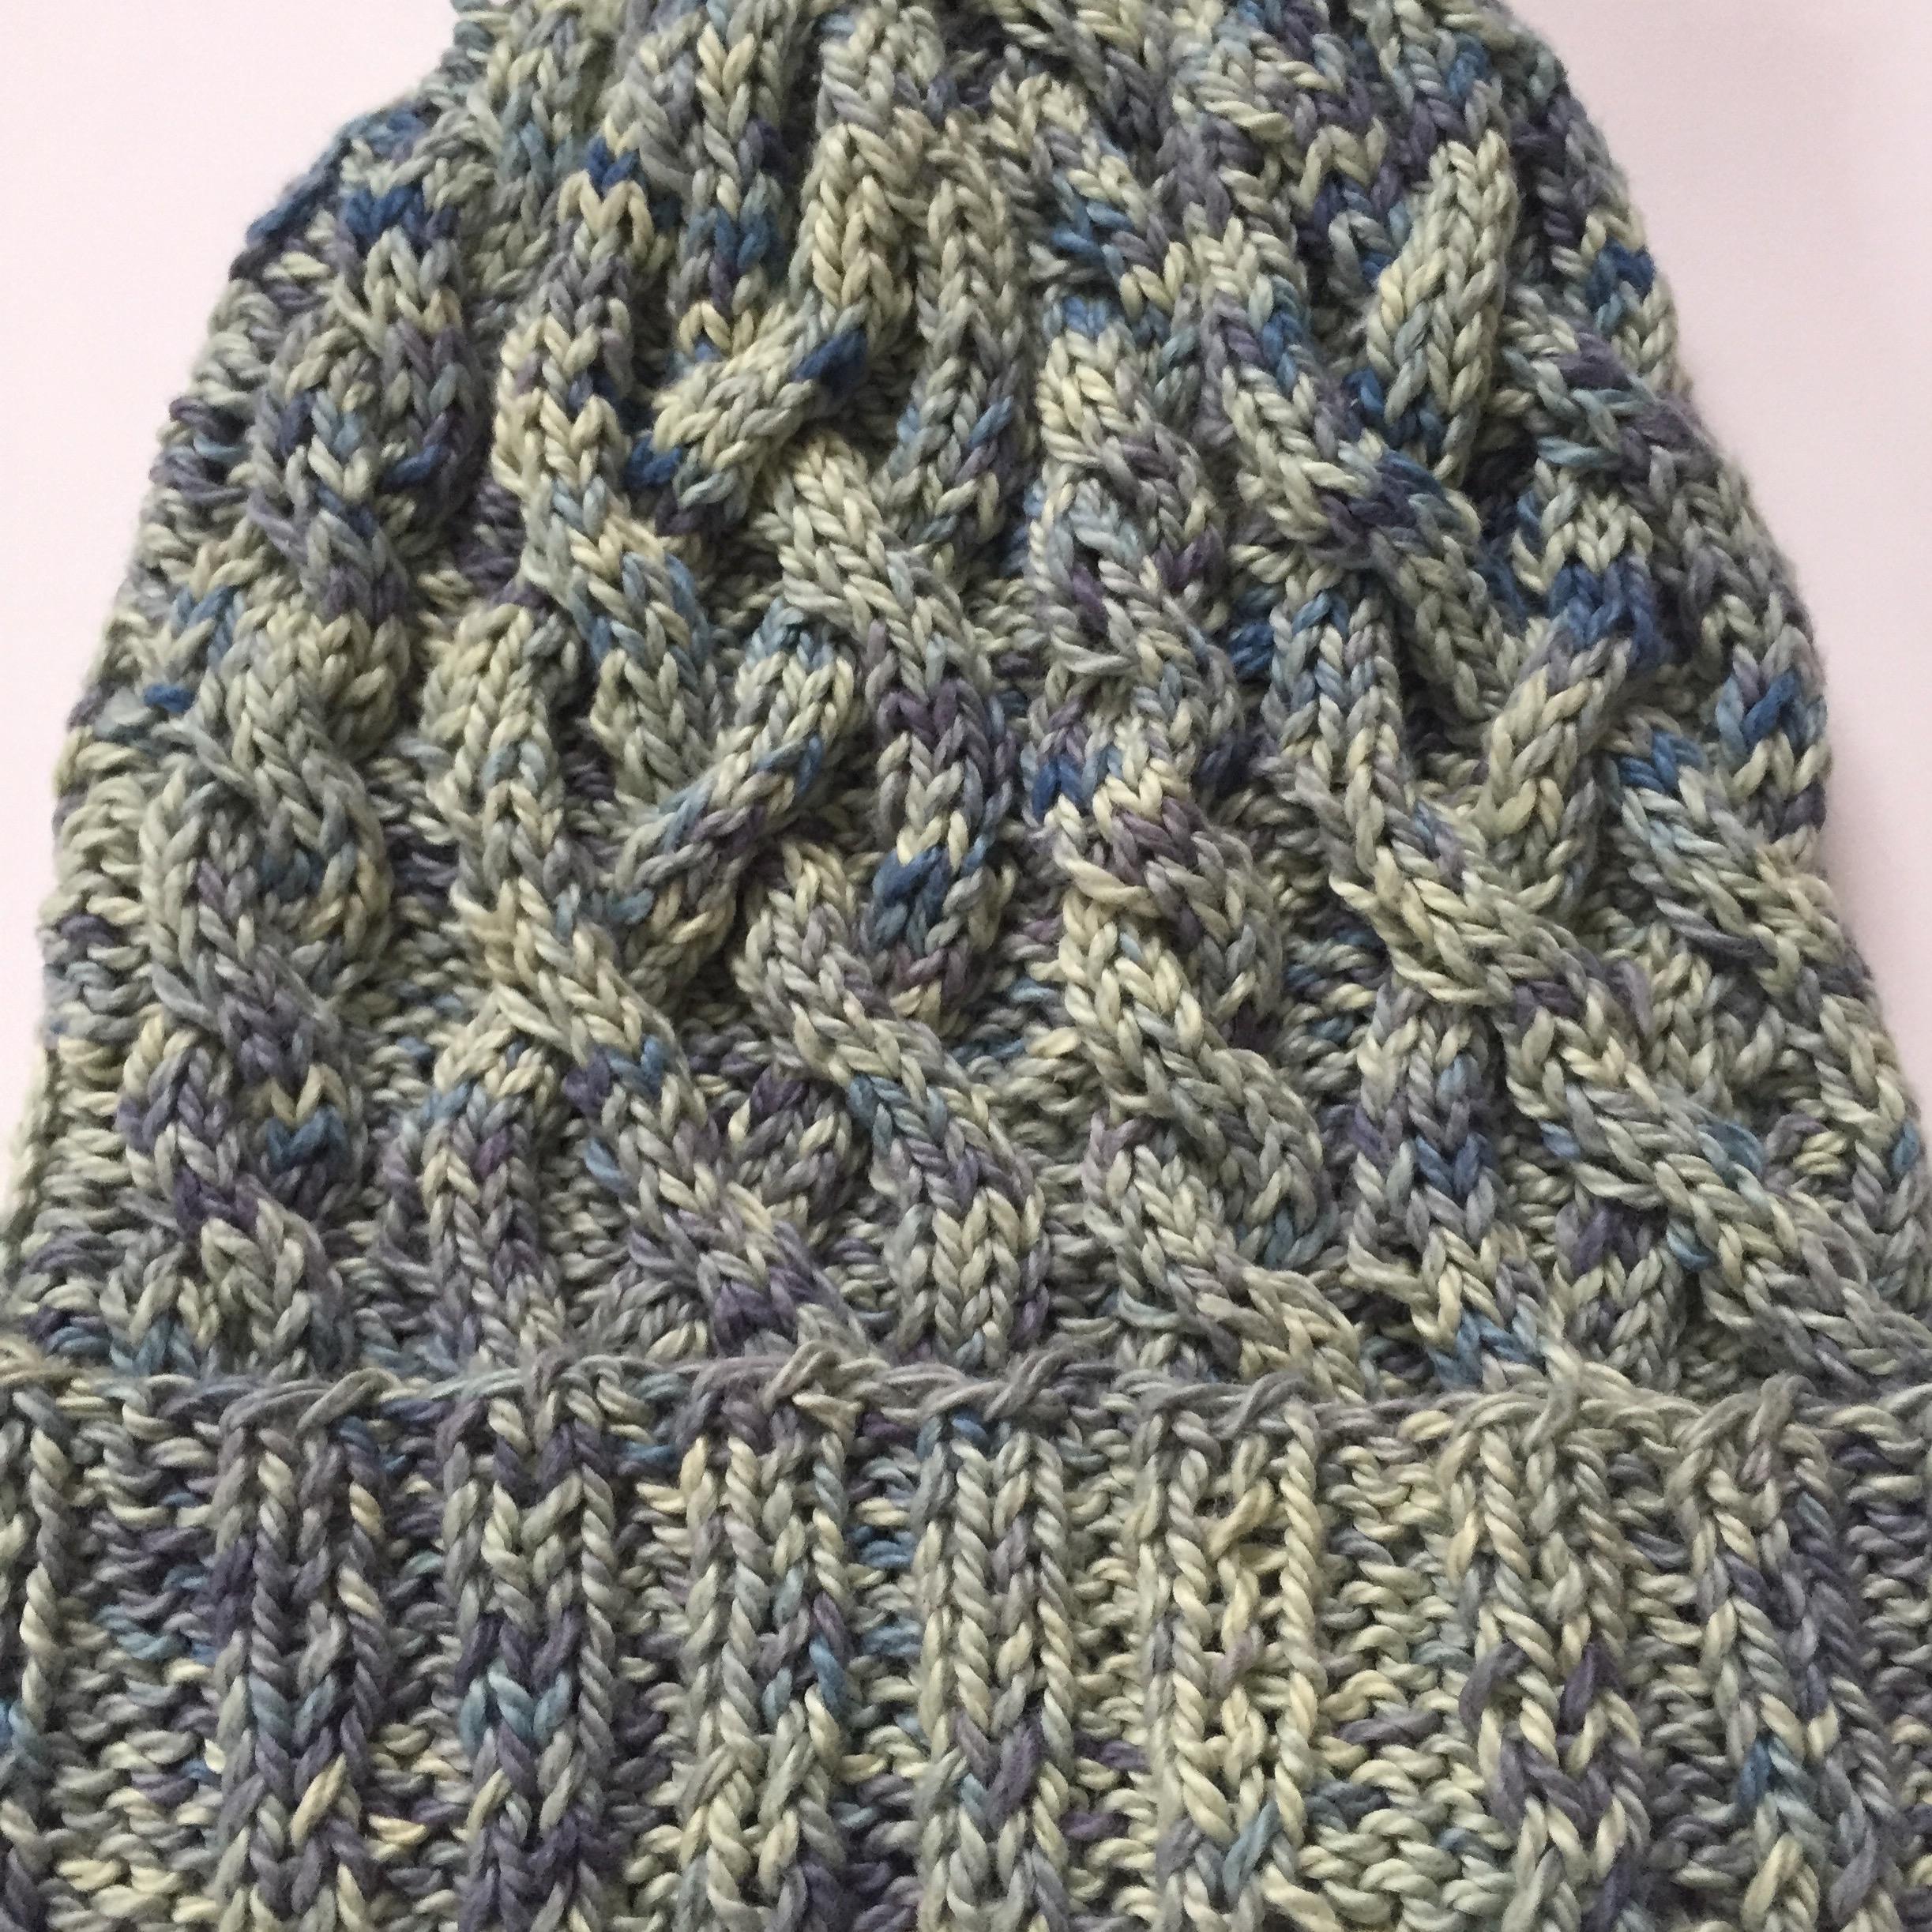 Dartily hat